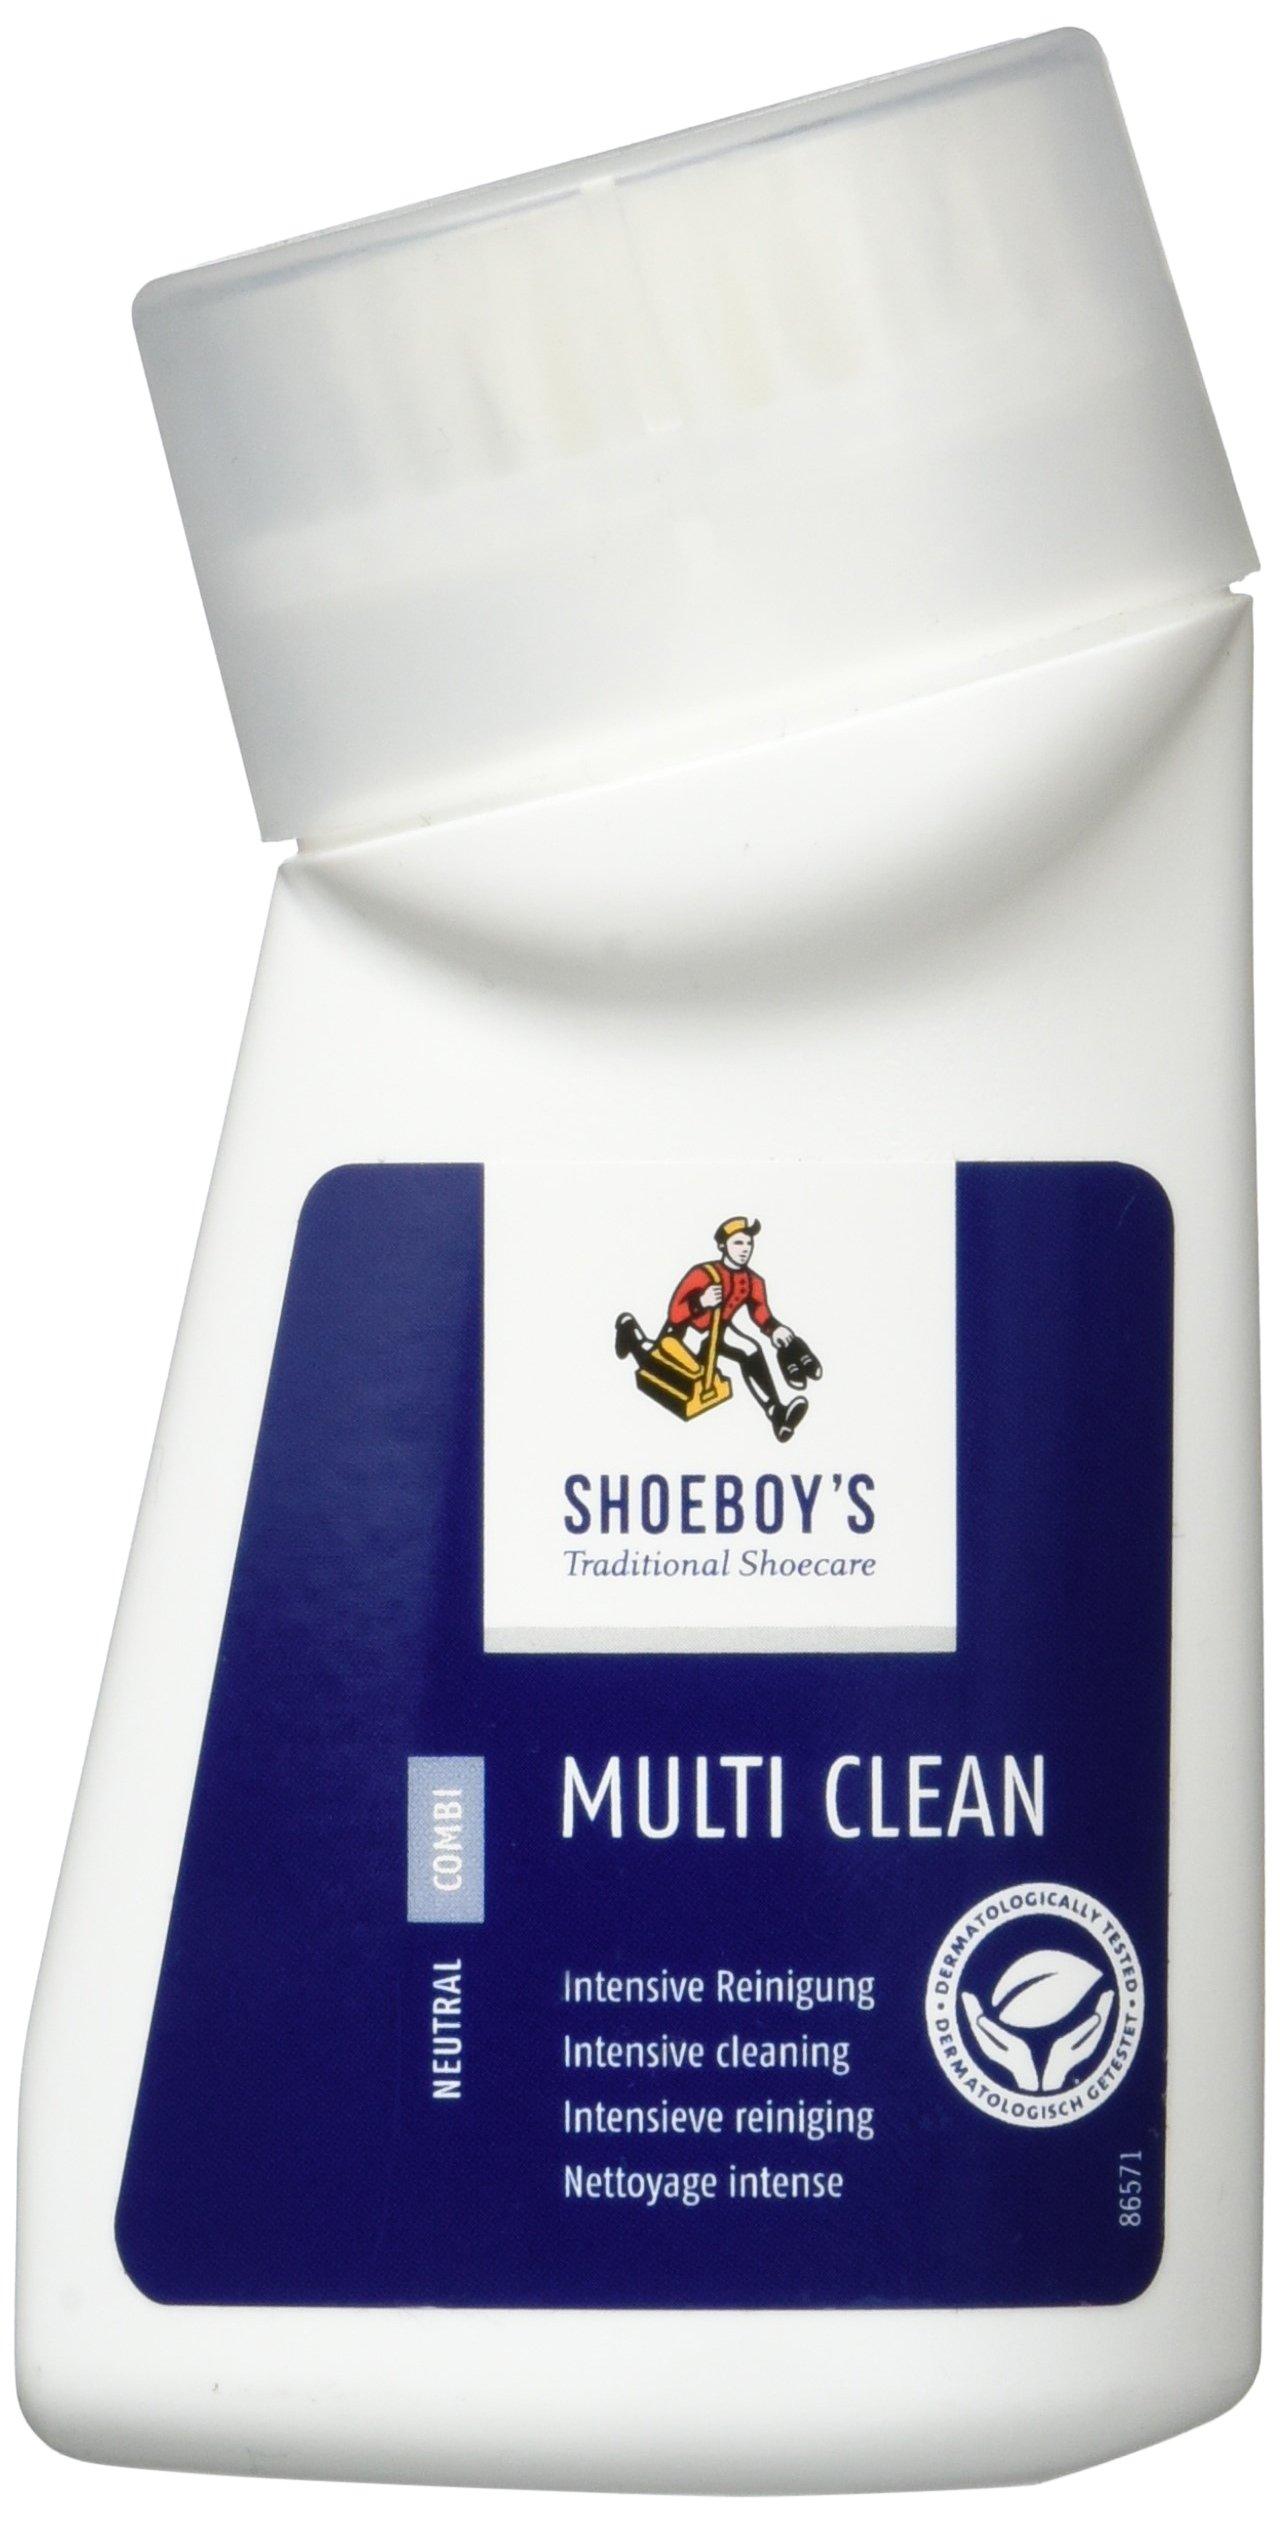 Multi Clean / Shoe Cleaner de Shoeboy con cepillo incorporad